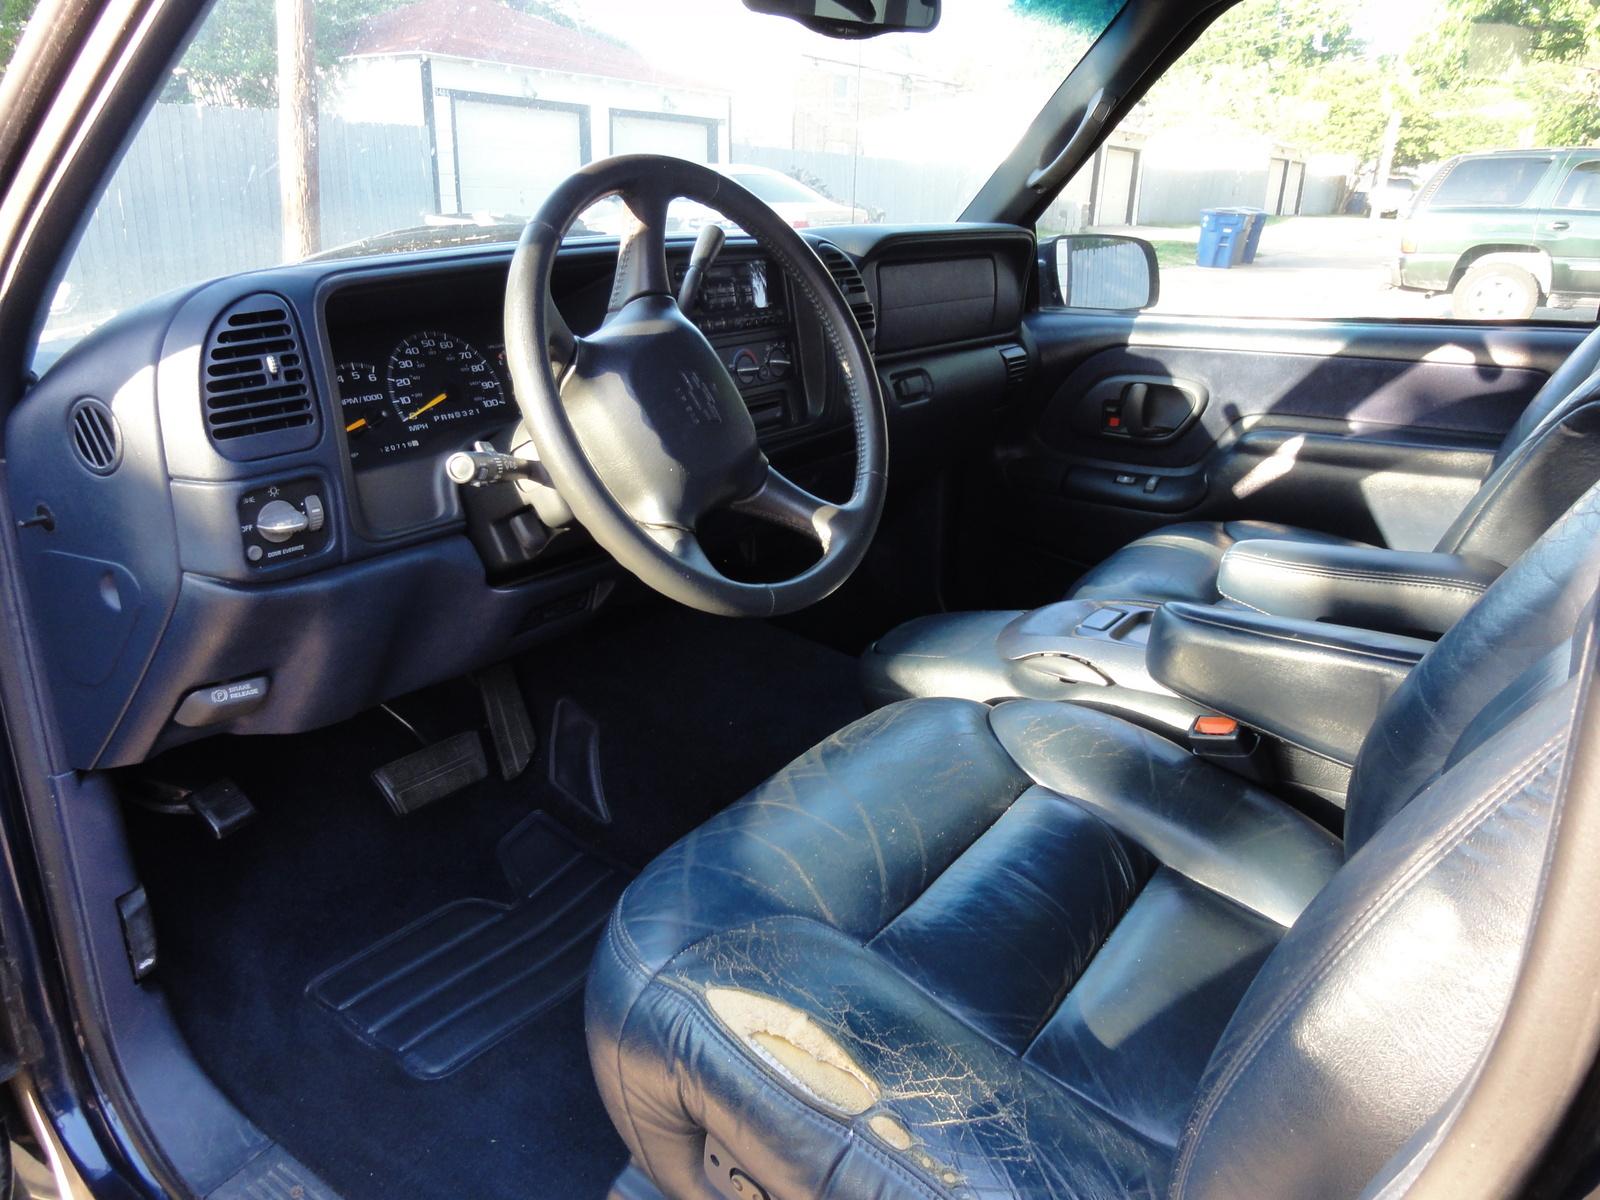 1996 Chevy Z71 Wiring Diagram